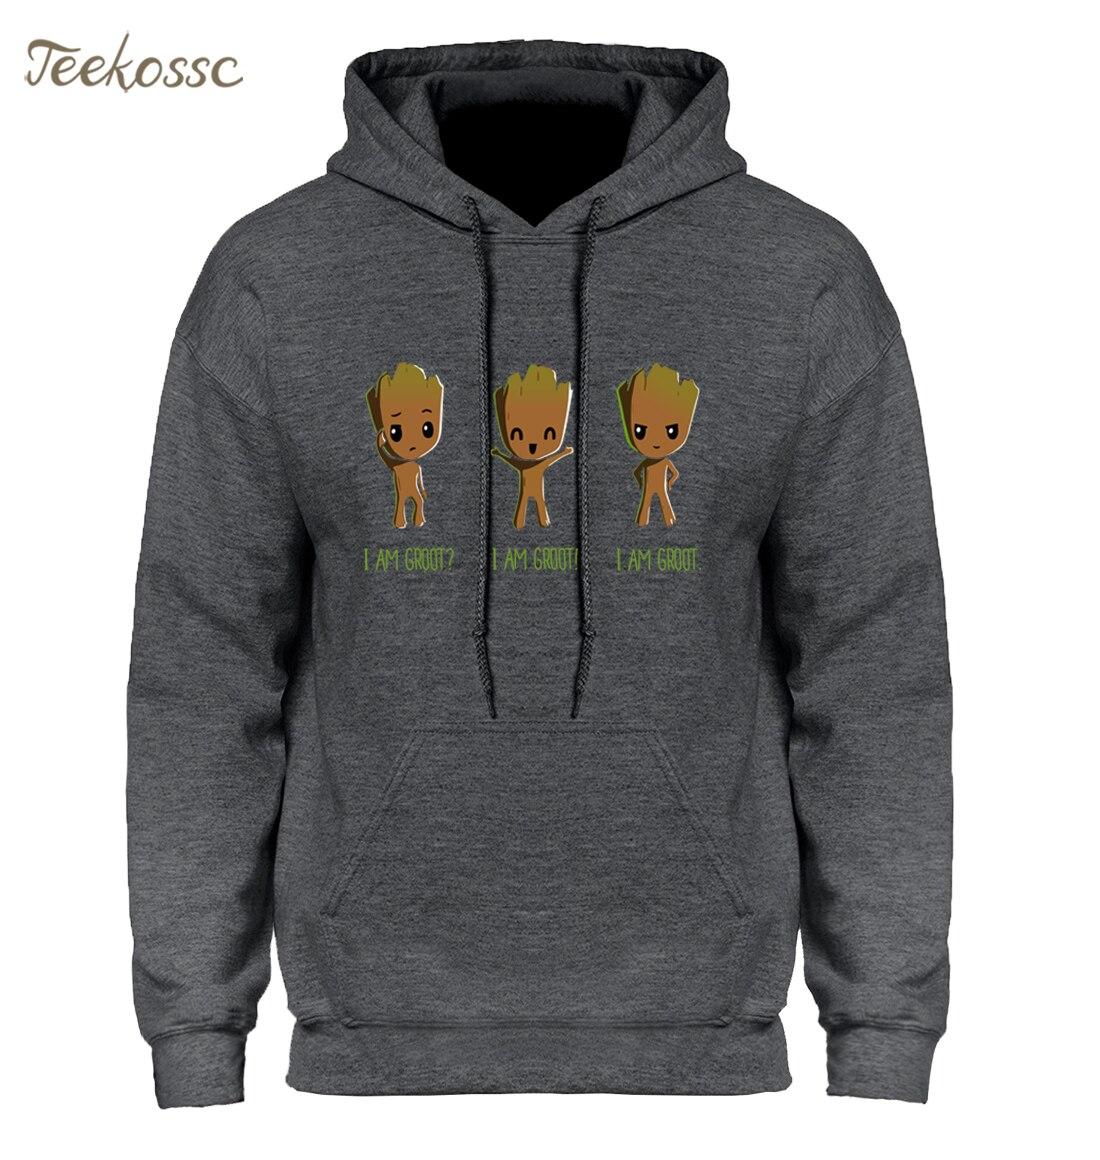 GROOT Hoodie Men Anime Baby Pop I AM Groot Hoodies Hipster Harajuku Hooded Sweatshirt New Brand Winter Autumn Cool Sportswear